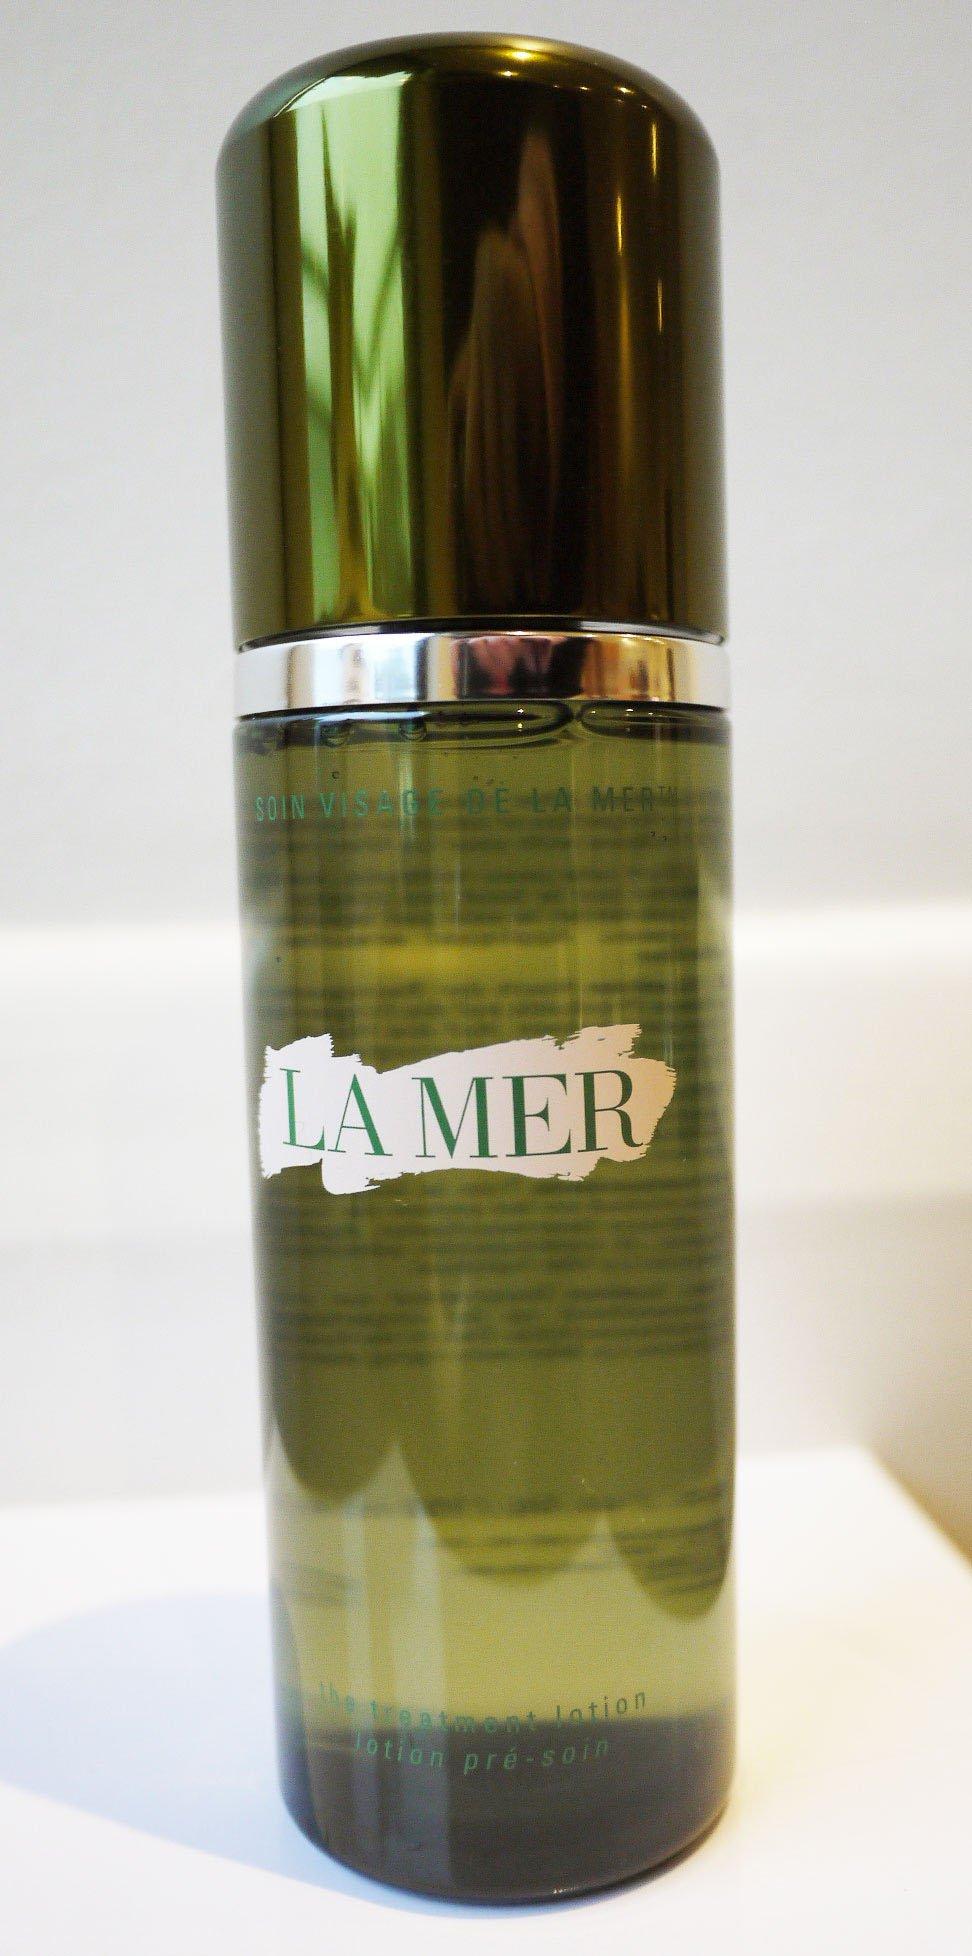 La Mer The Treatment Lotion - Travel Size